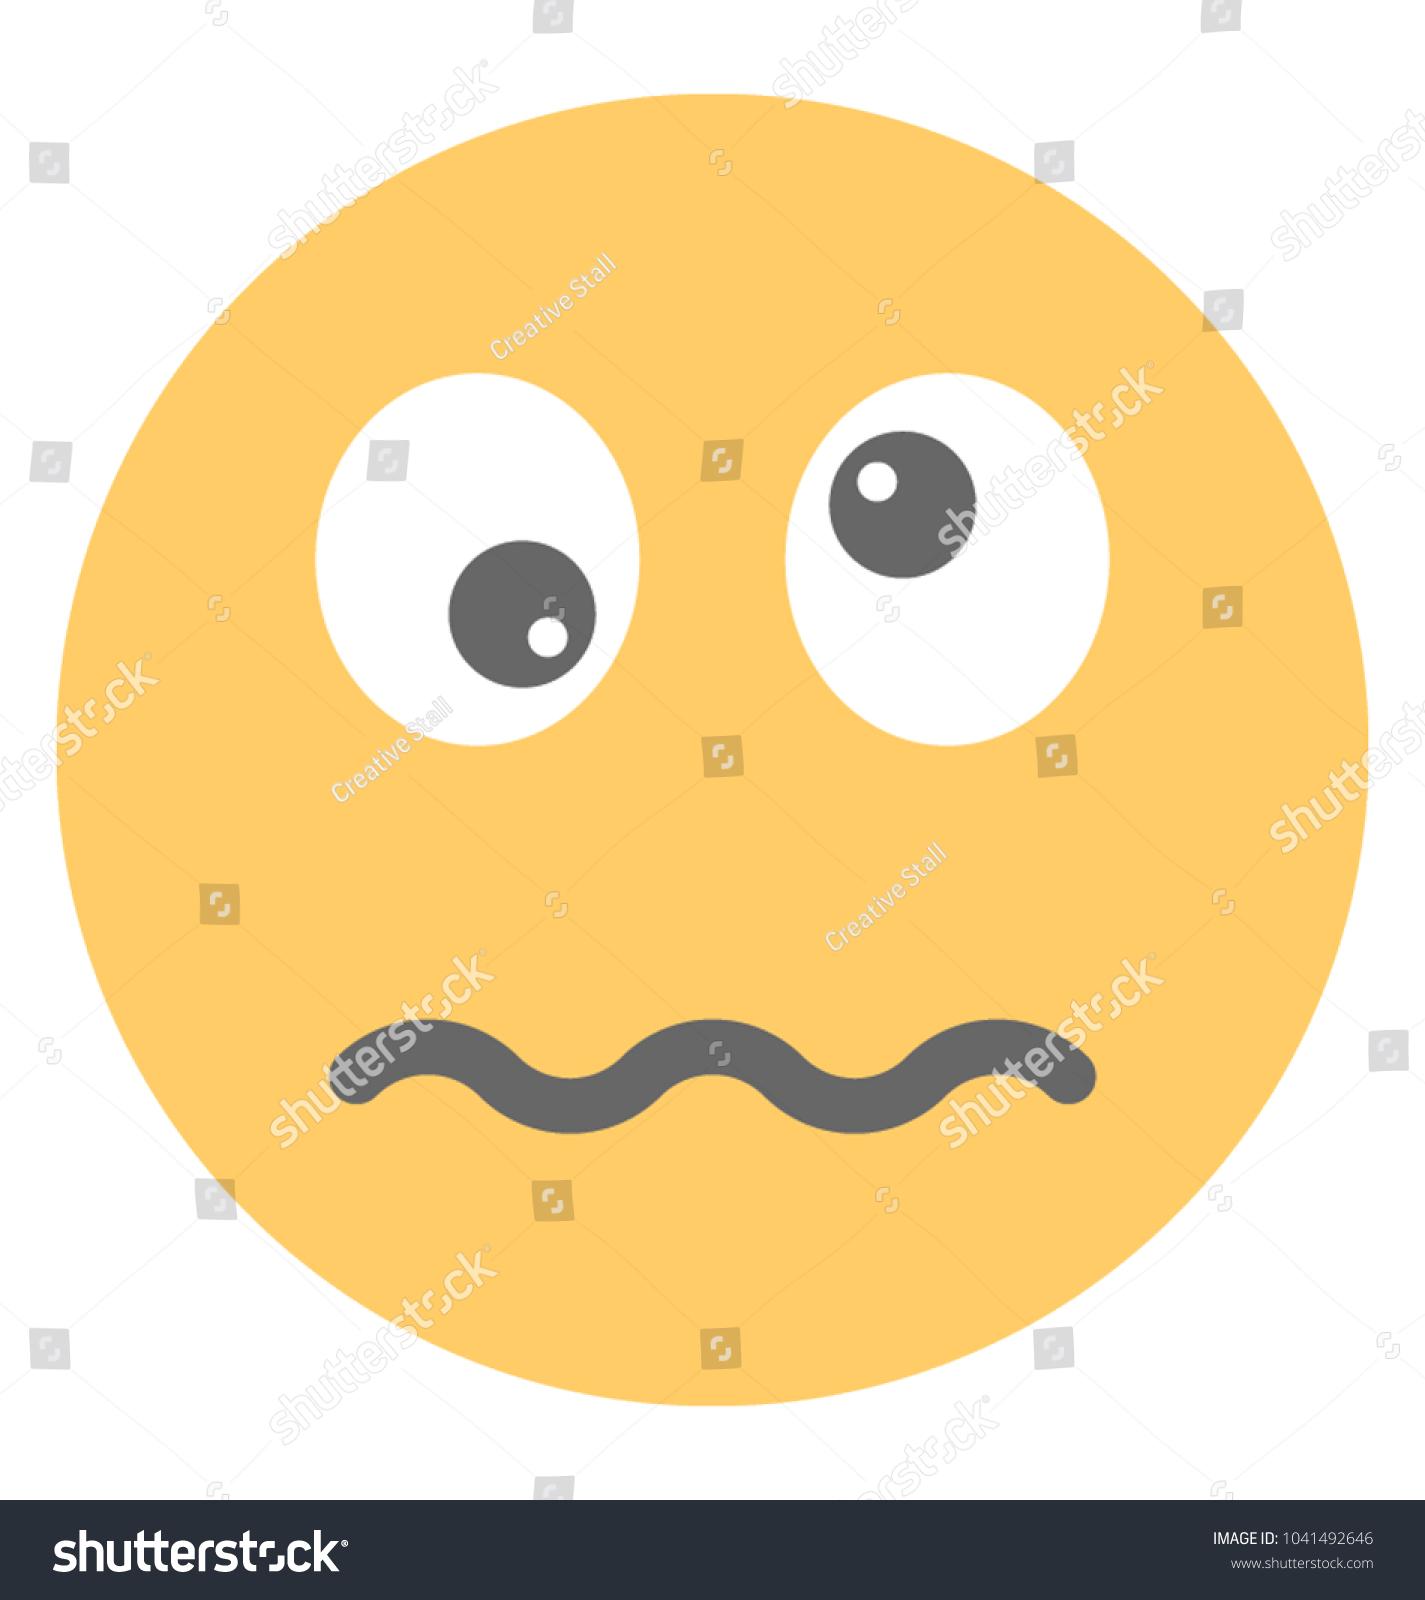 Sad face cartoon pictures impremedia sad face emoticon symbol gallery symbol and sign ideas a sad face emoji depressed smiley stock buycottarizona Gallery